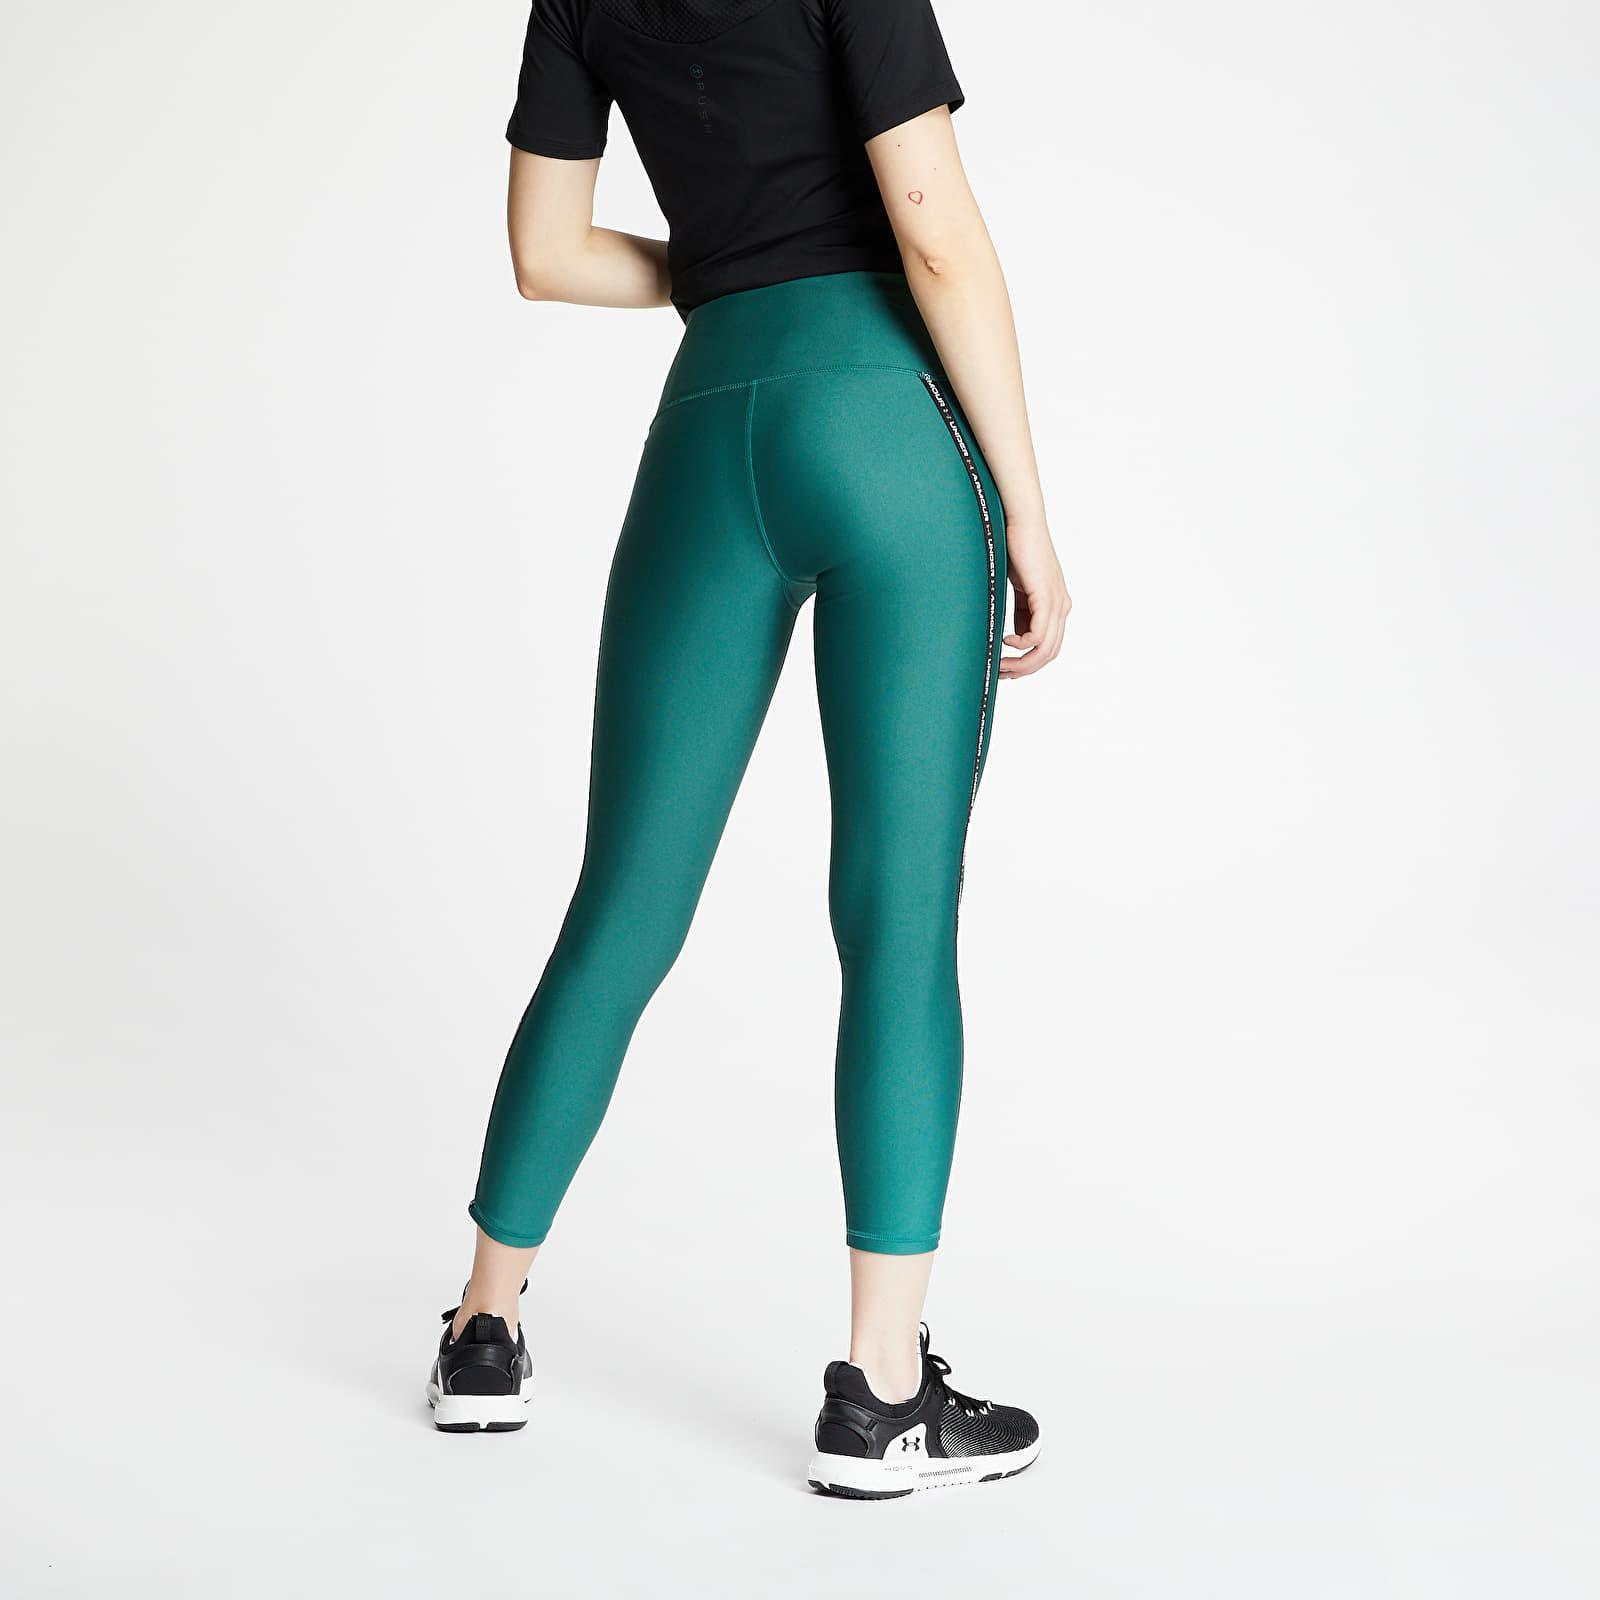 Pants and jeans Under Armour HG Armour WMT Ankle Crop Pants Saxon Green/ Black/ Black